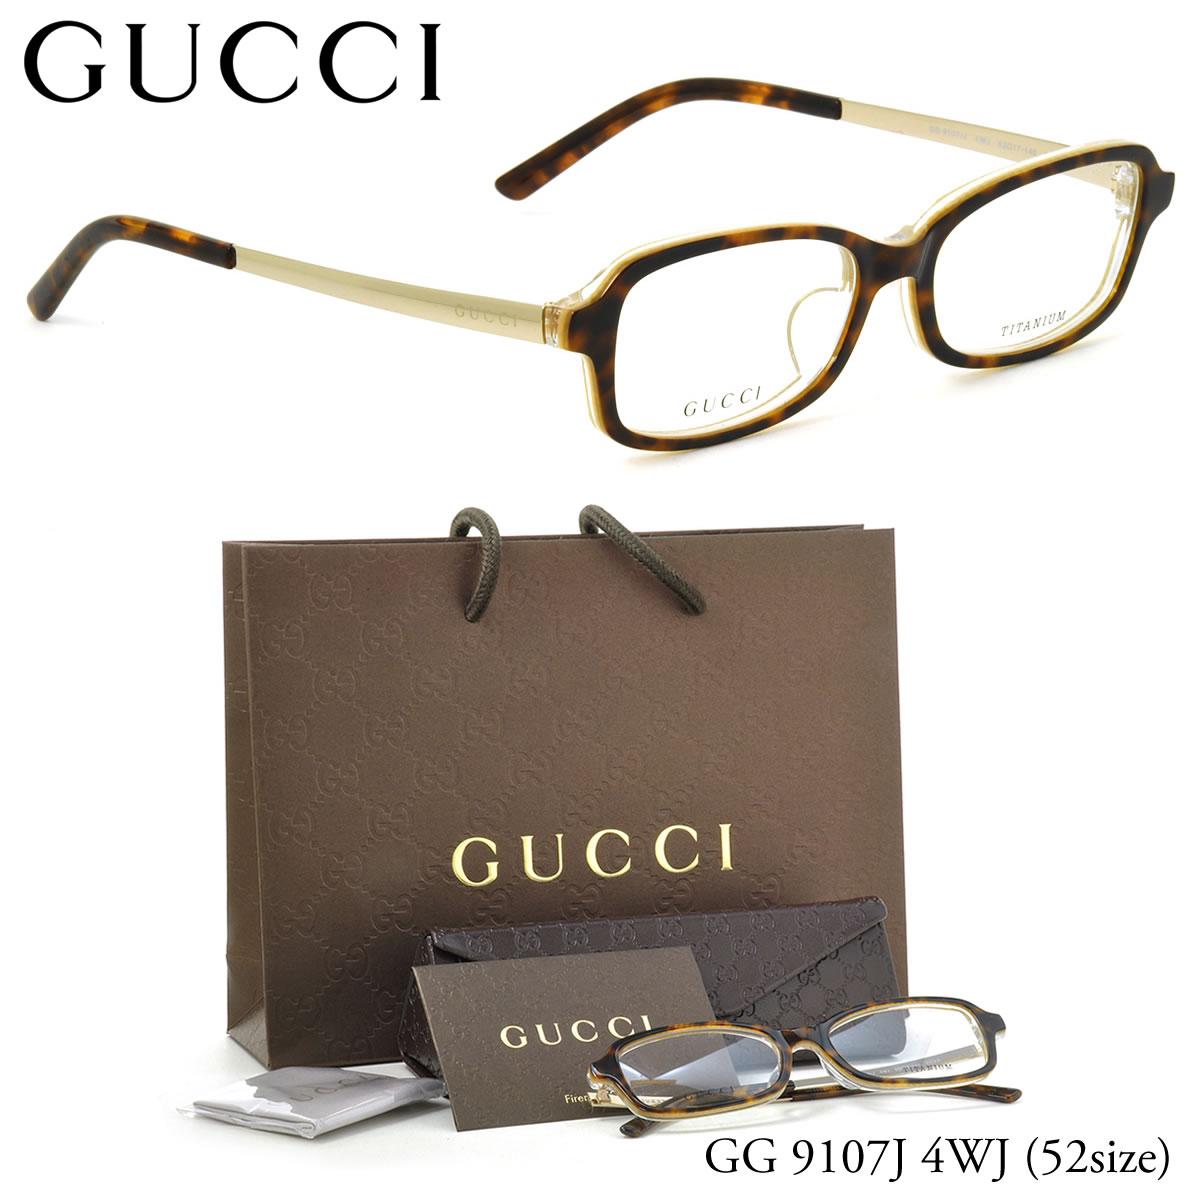 Titanium Frame Glasses Philippines : Optical Shop Thats Rakuten Global Market: (GUCCI ...